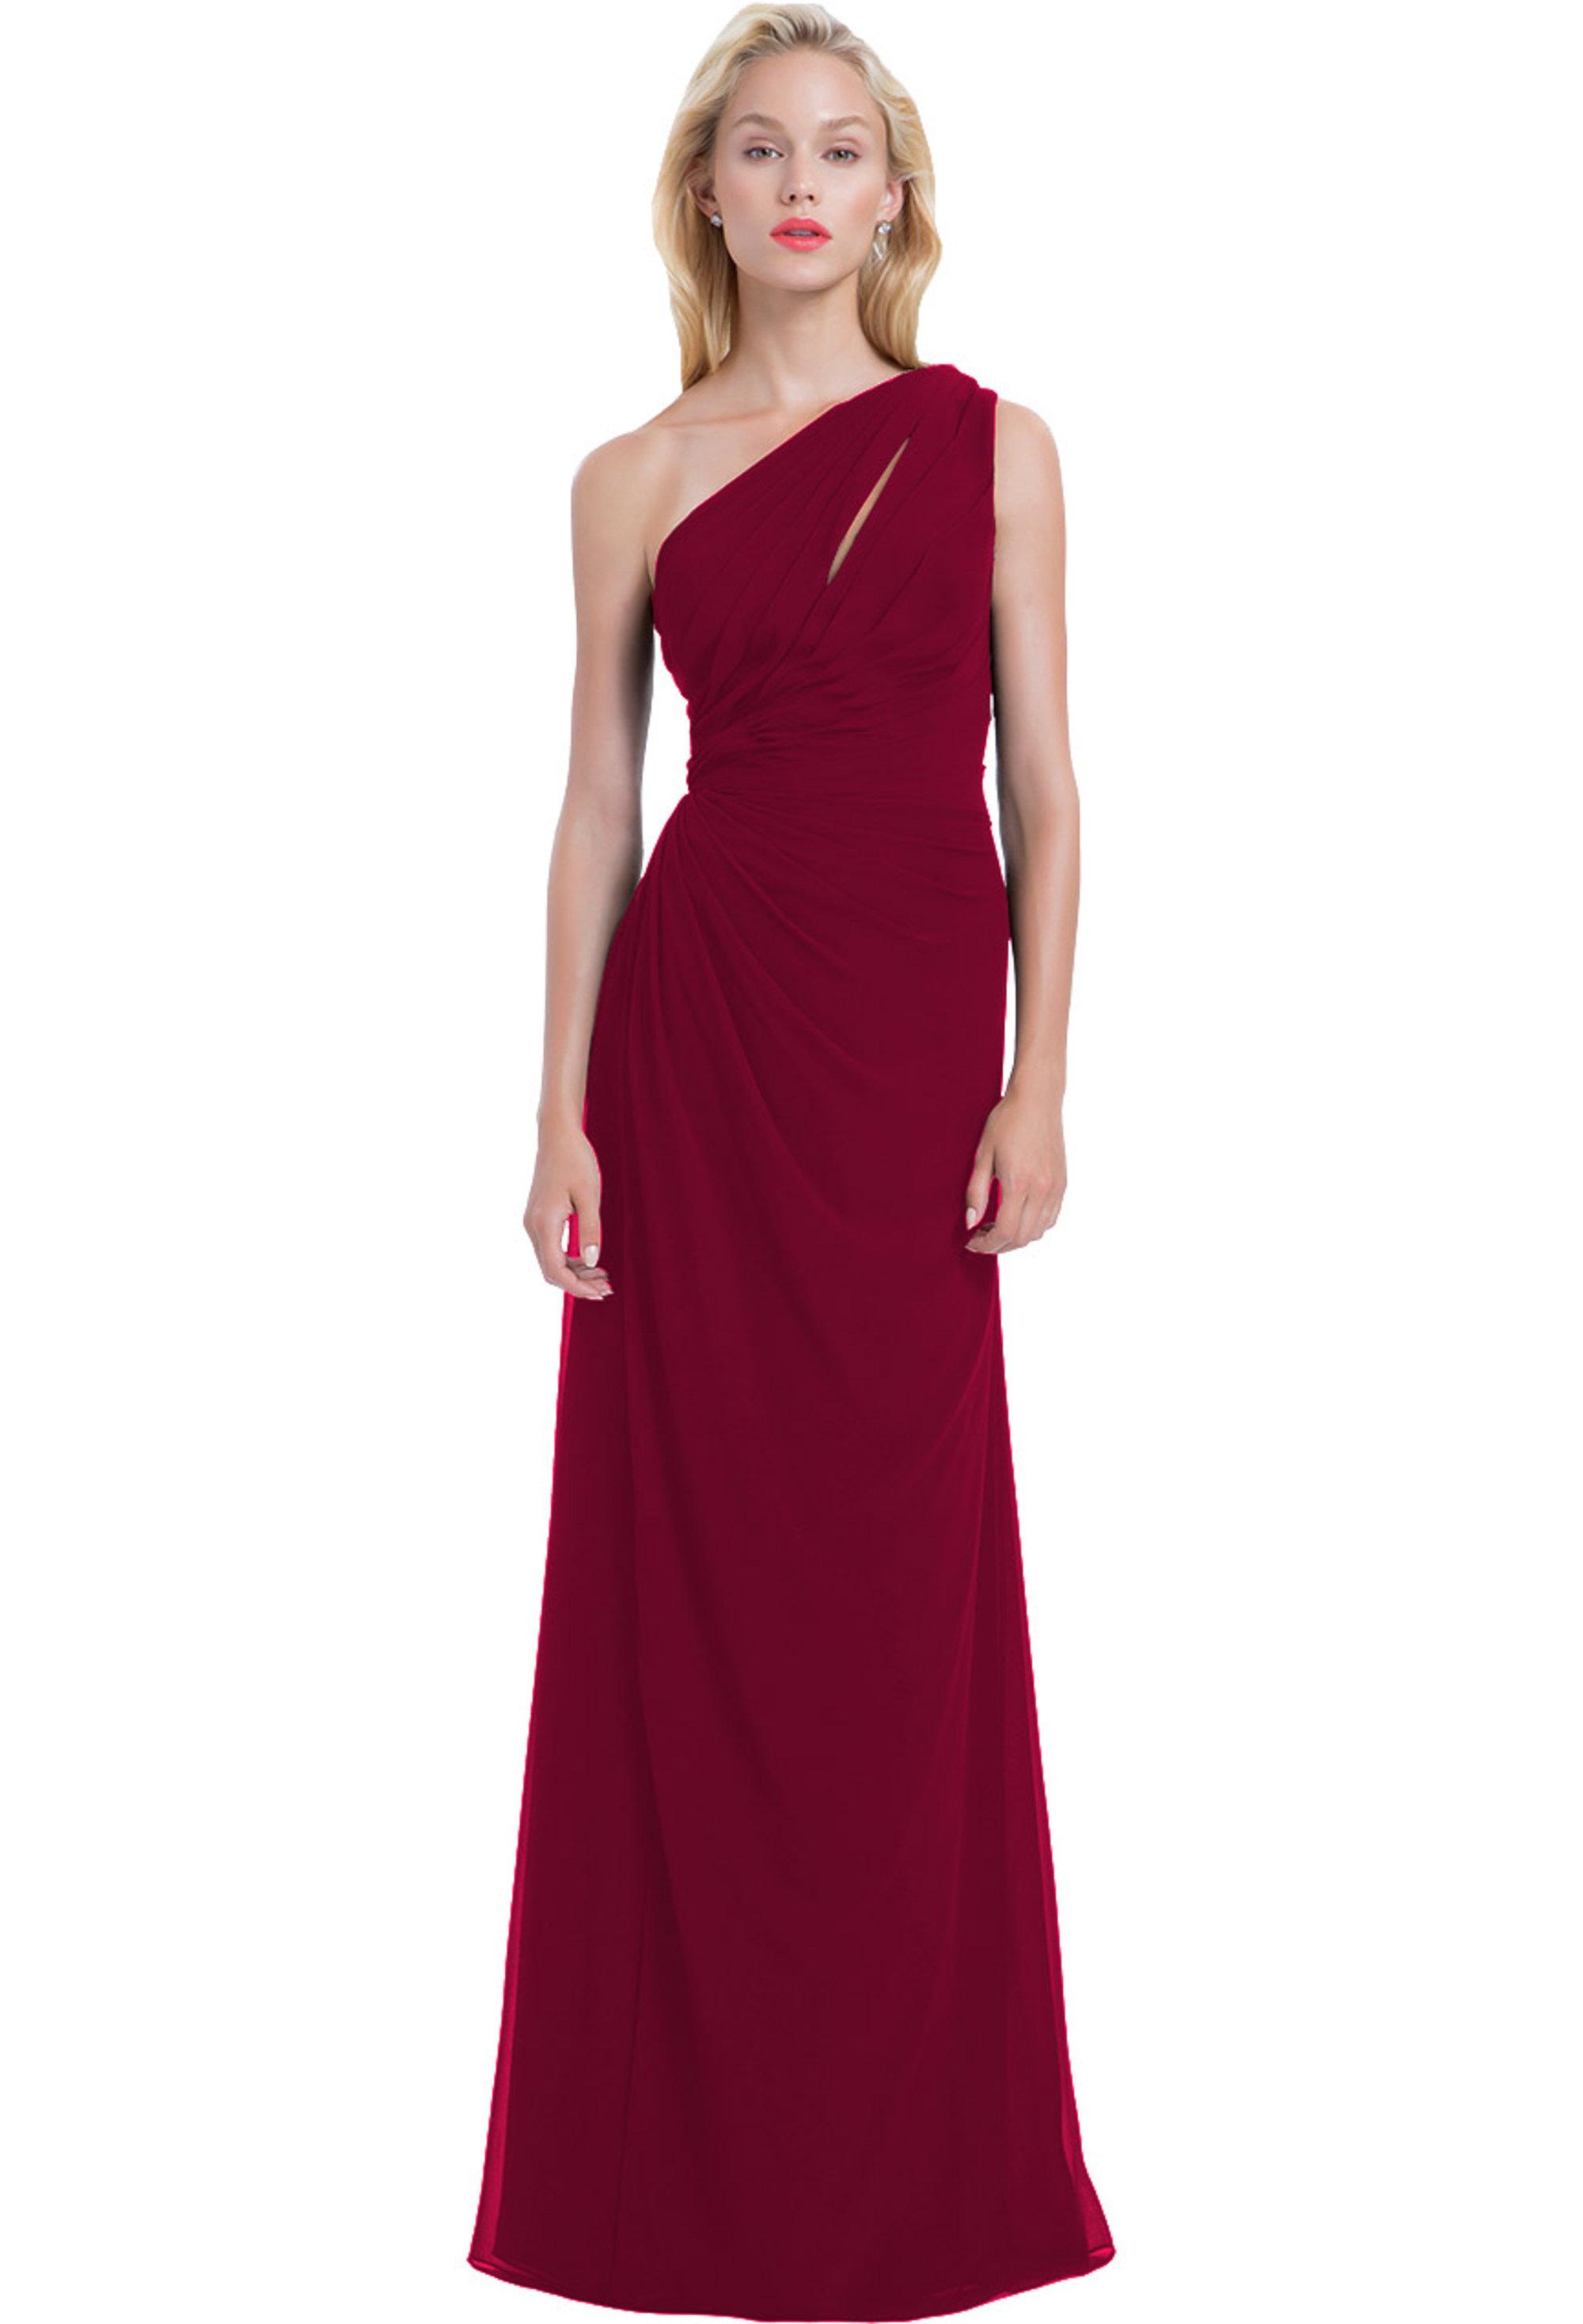 Bill Levkoff CRANBERRY Chiffon Front Cutout Asymmetrical gown, $220.00 Front